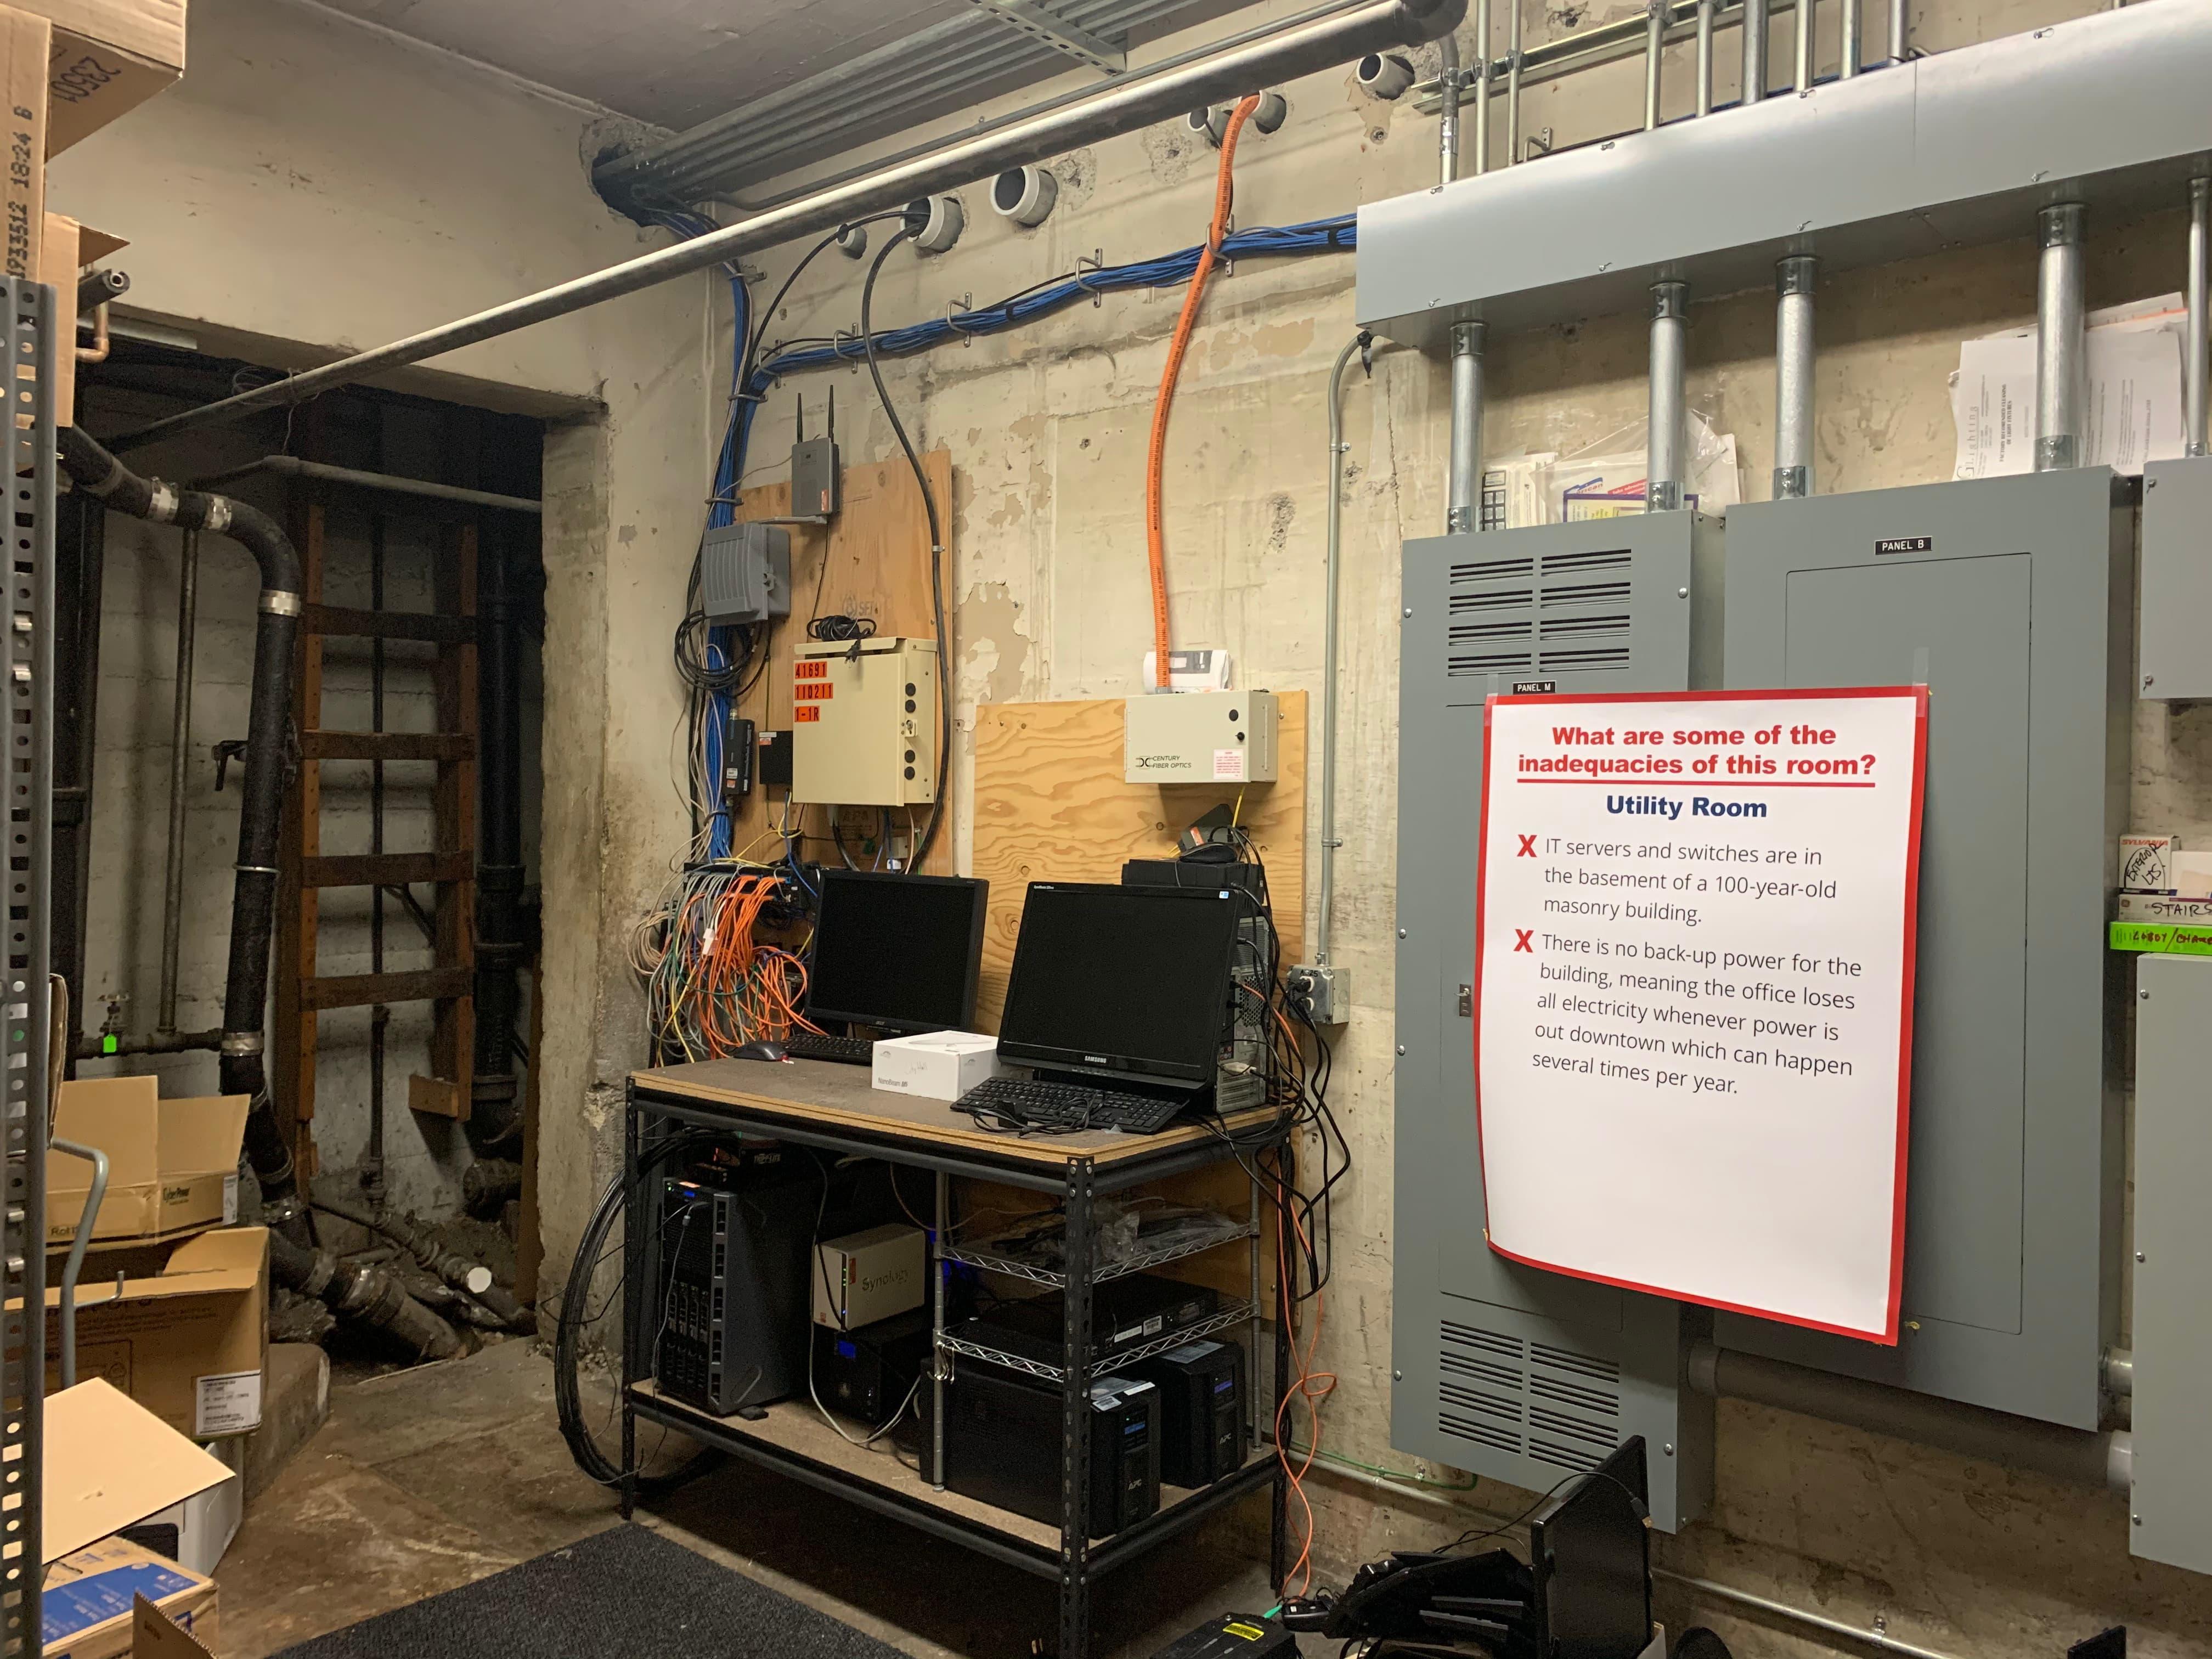 IT Server/Utility Room